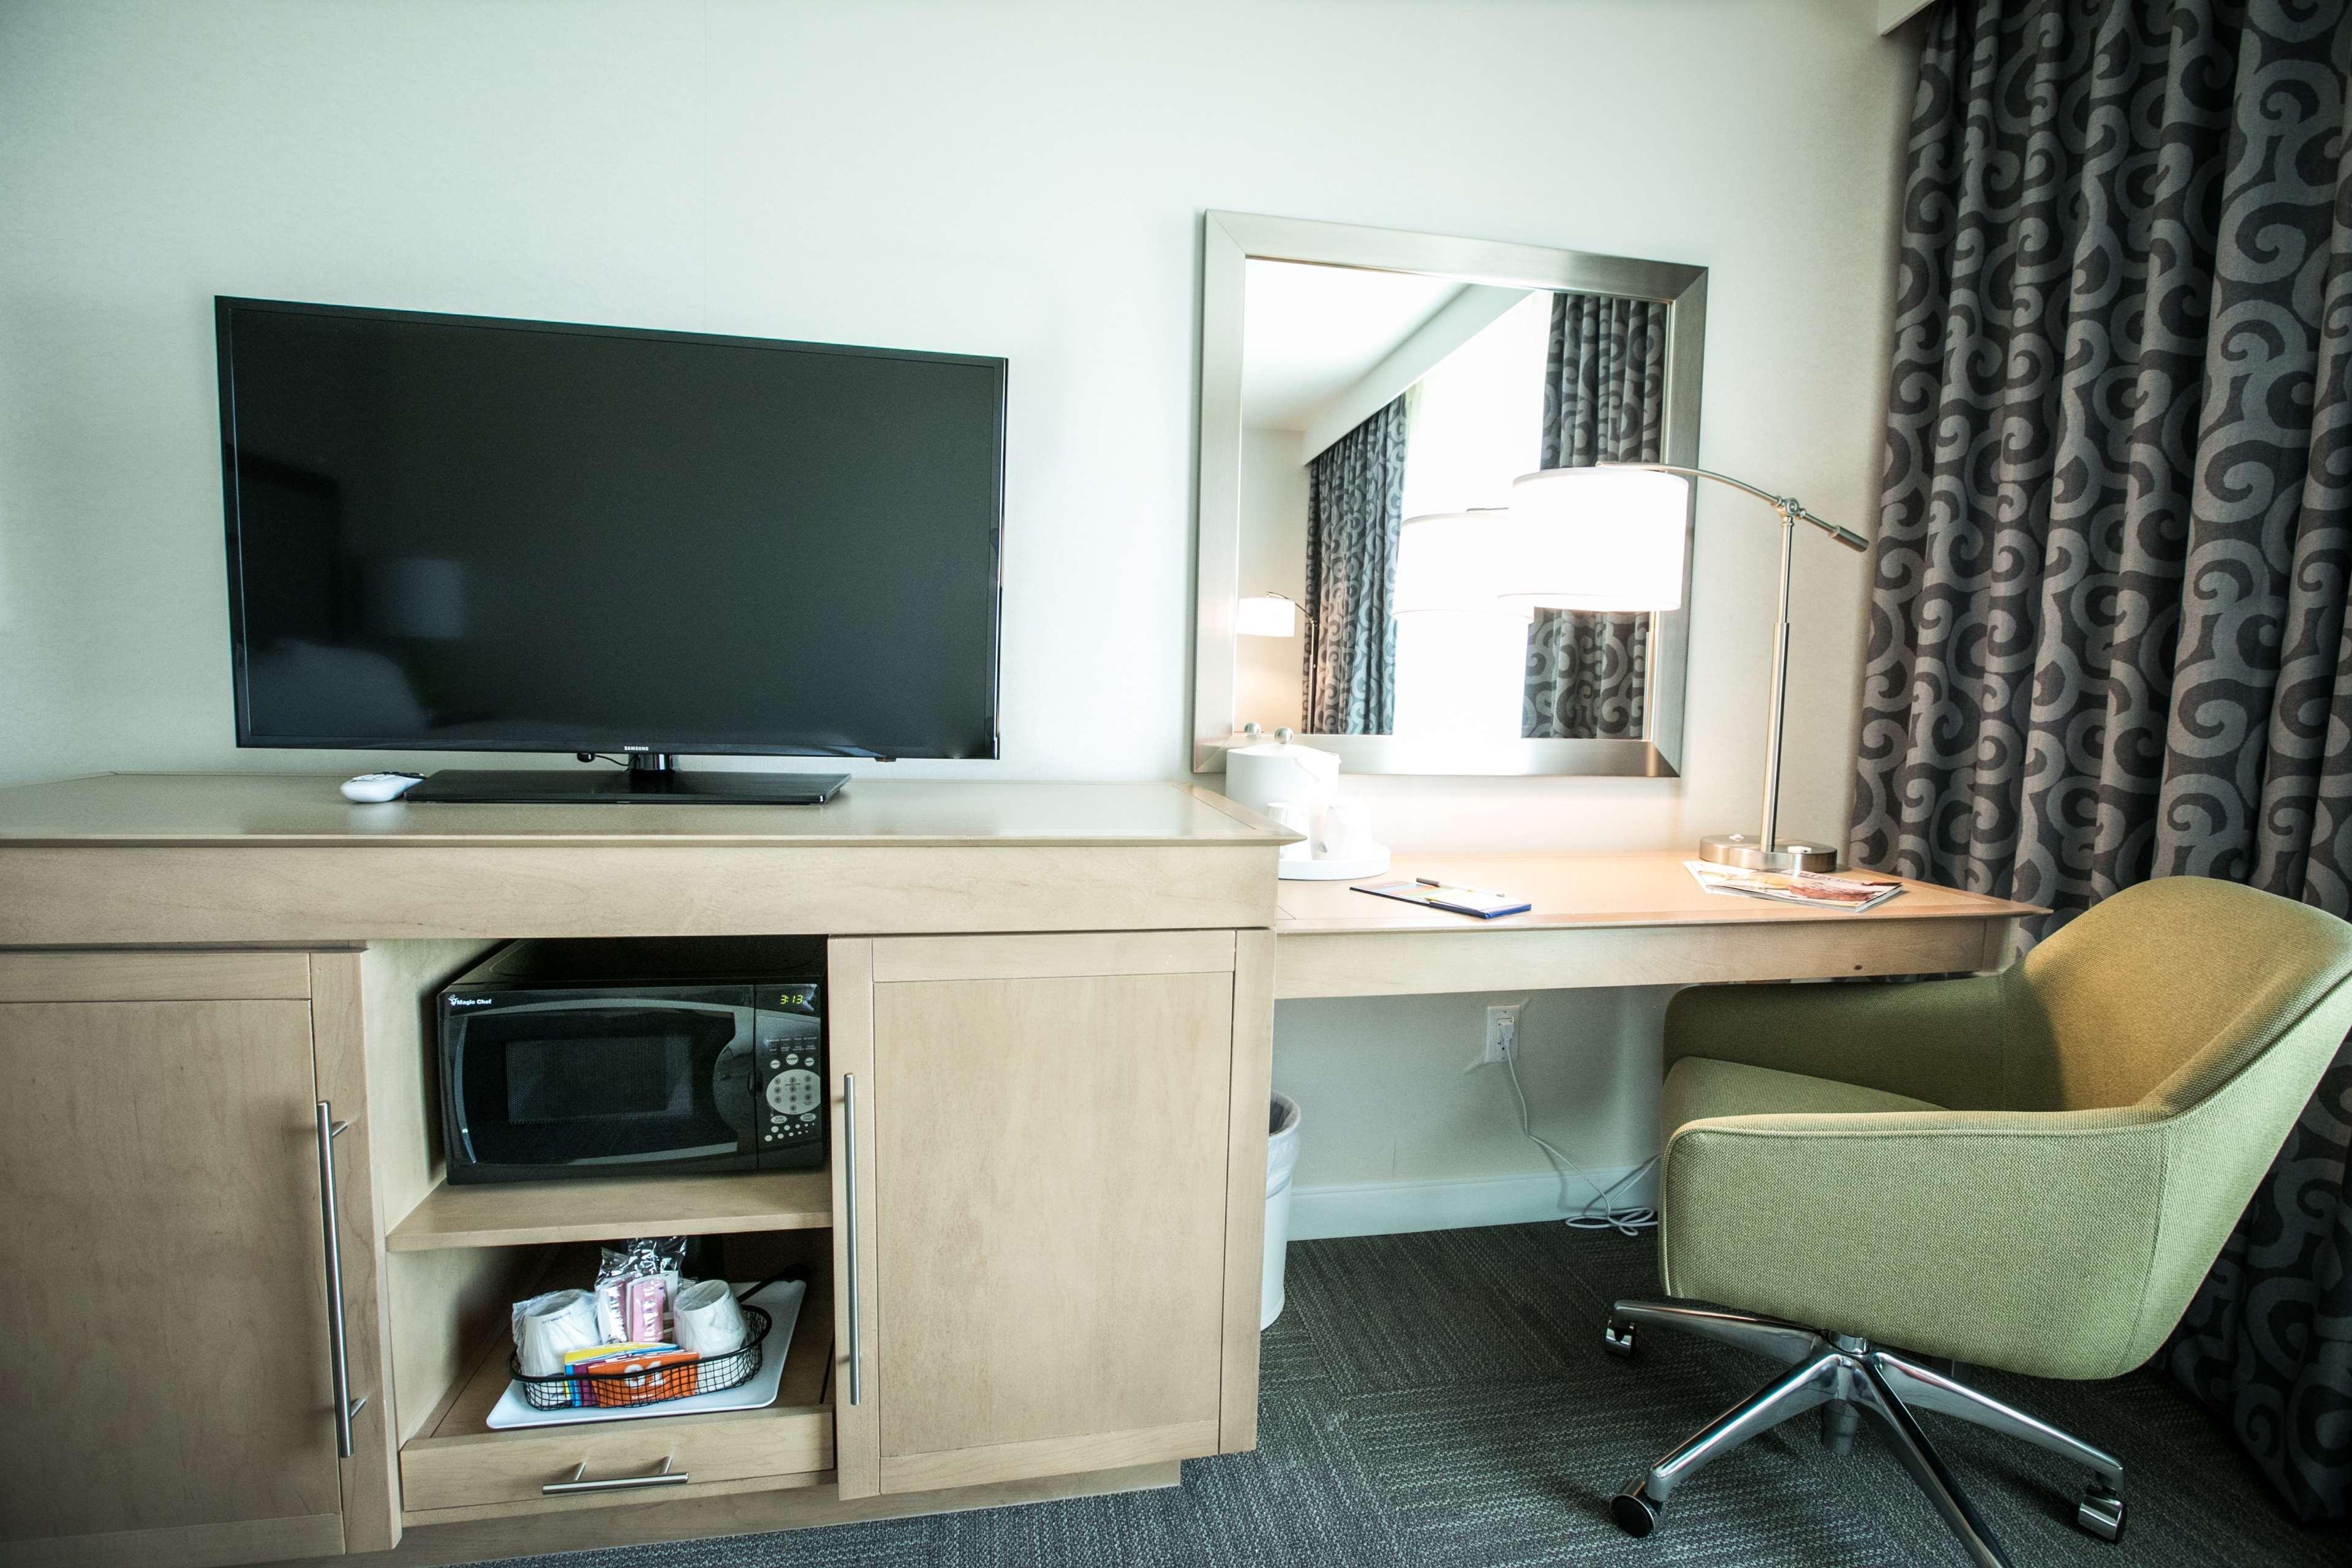 Hampton Inn & Suites Tempe - Phoenix Airport image 21